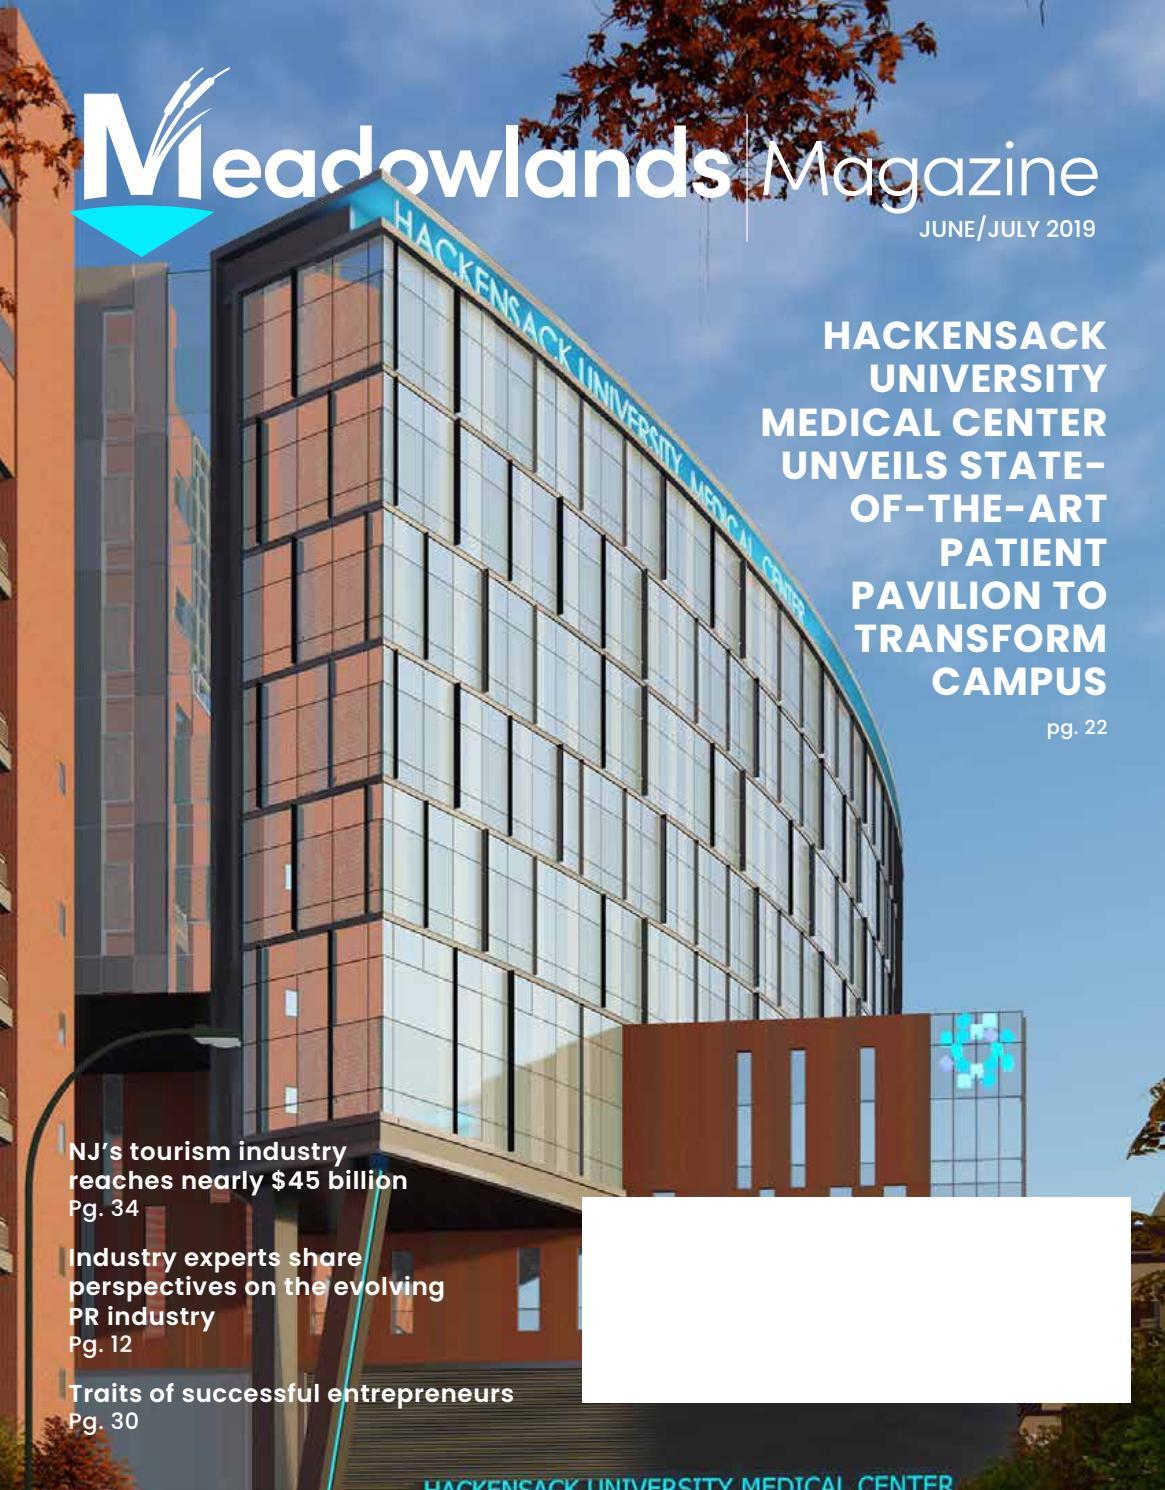 meadowlands magazine - june/july 2019 by meadowlands media